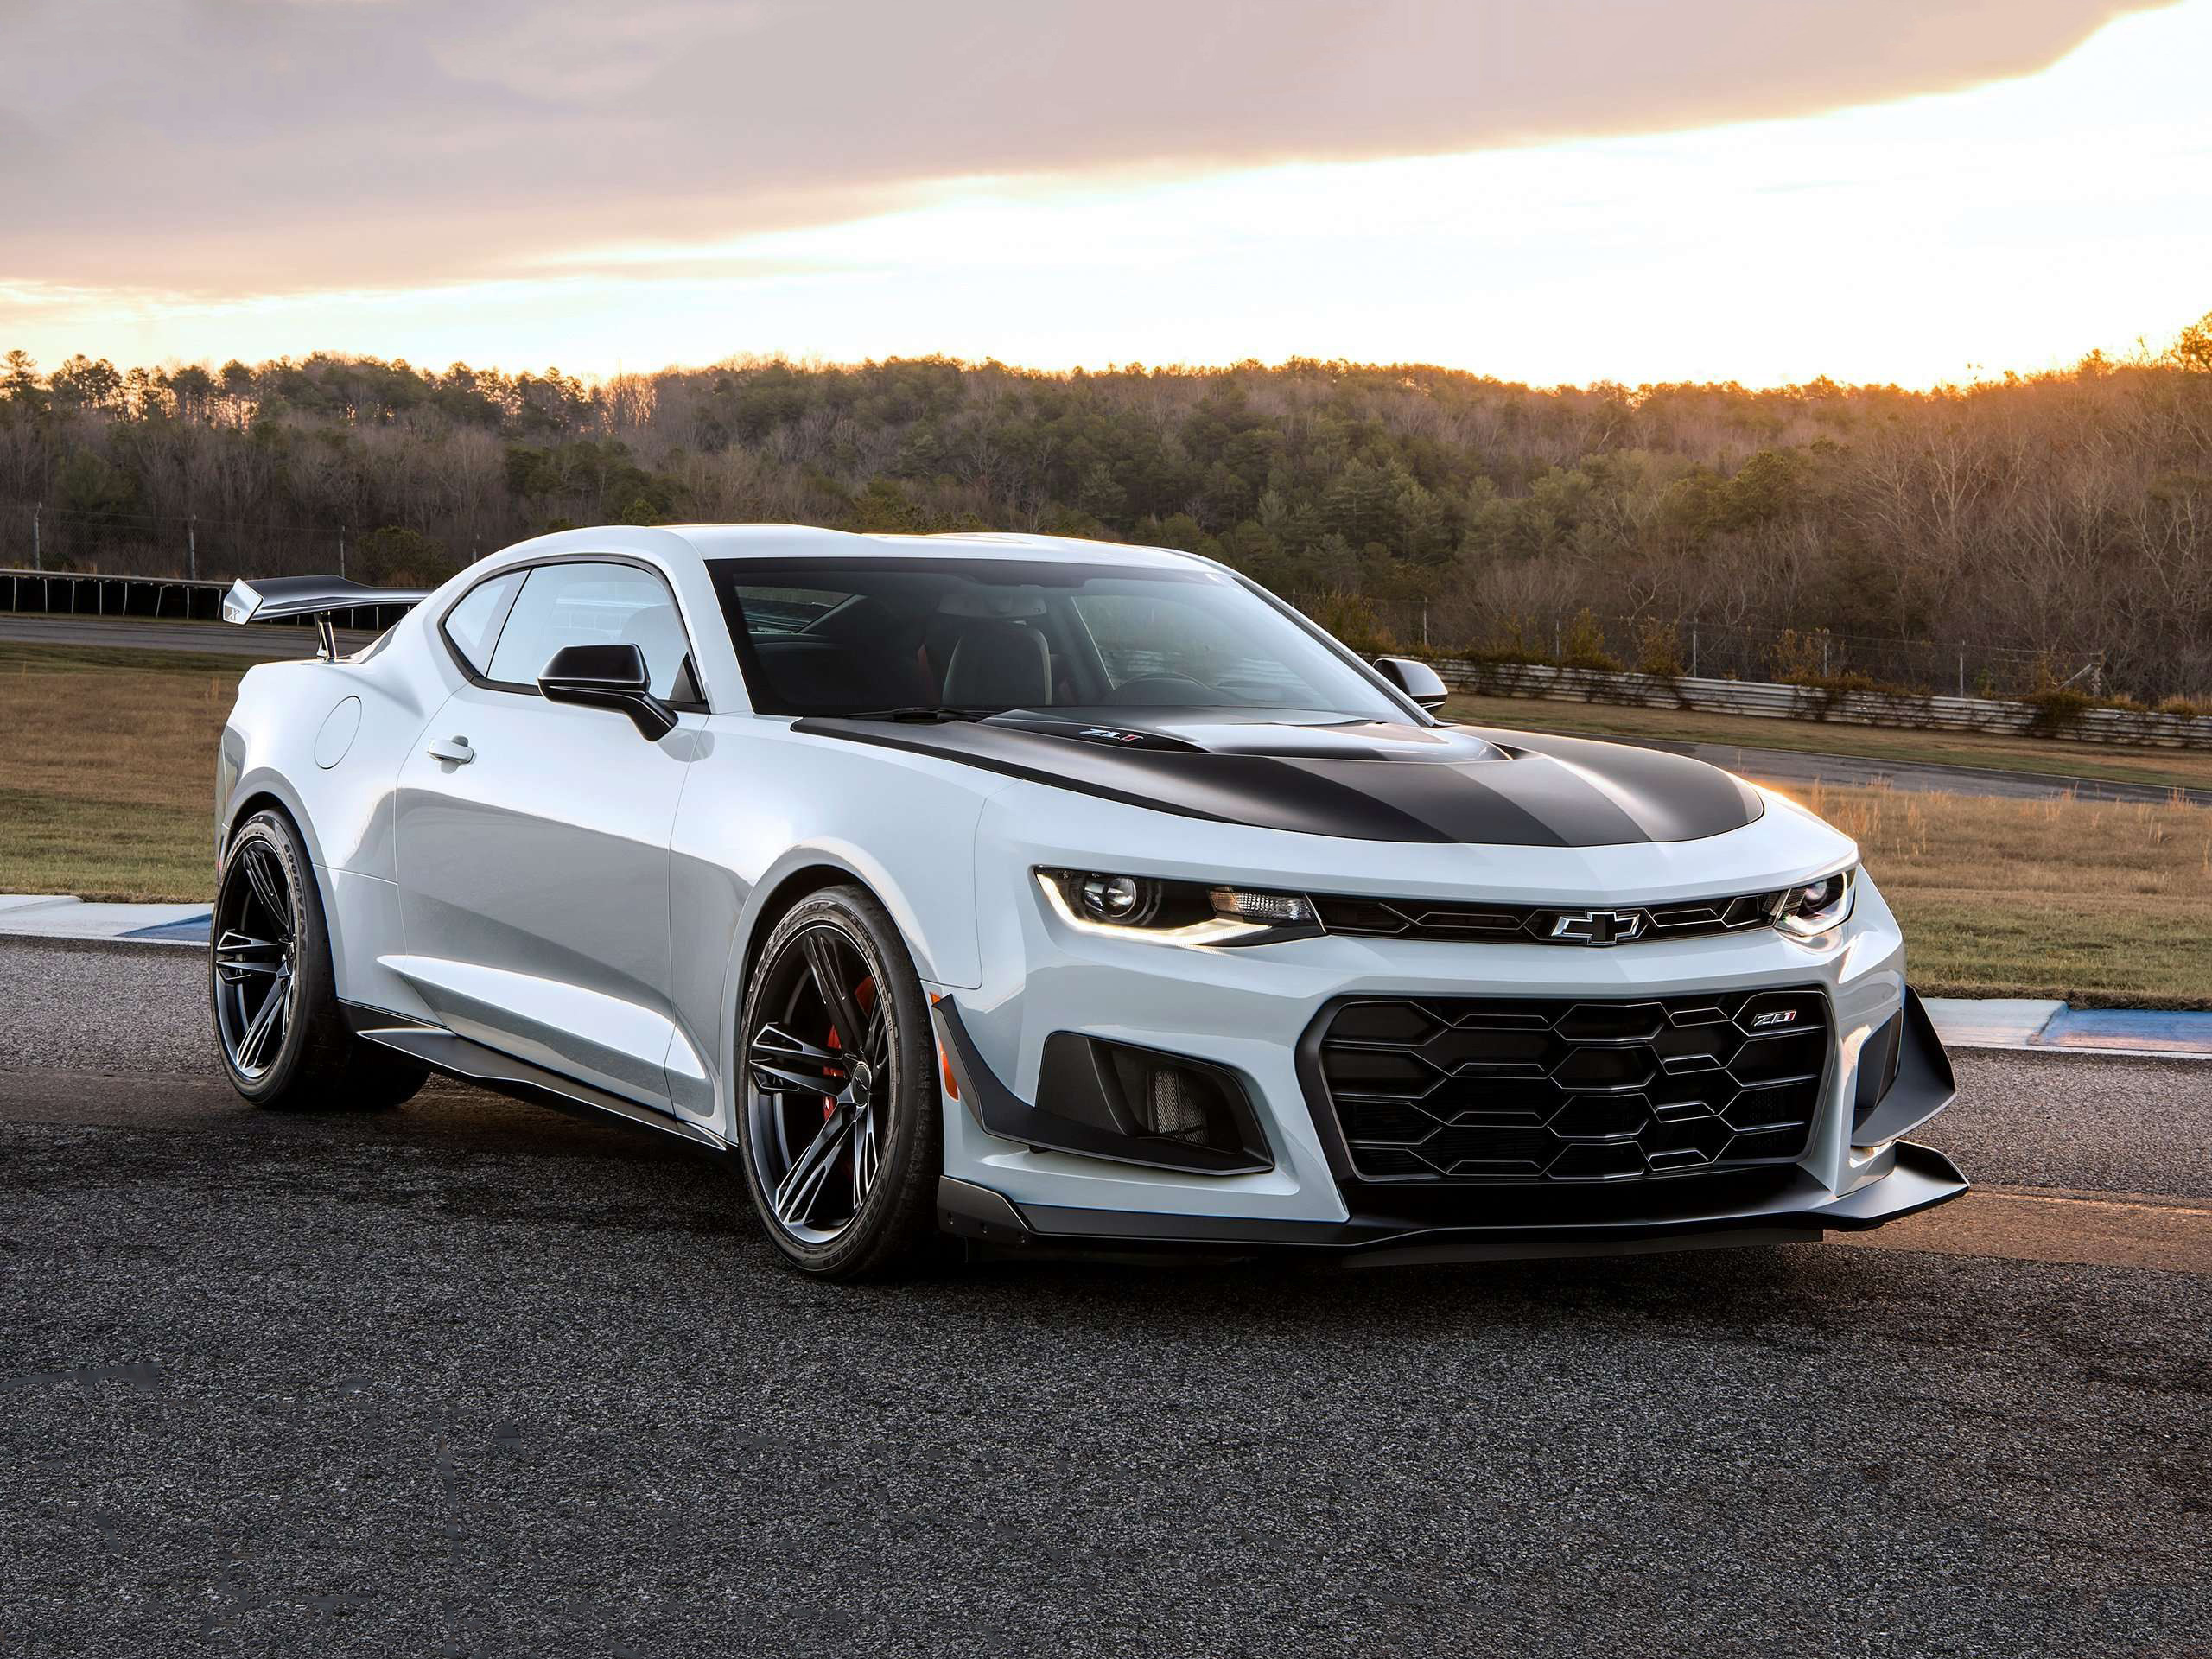 2018 Chevrolet Camaro Wallpapers ① Wallpapertag